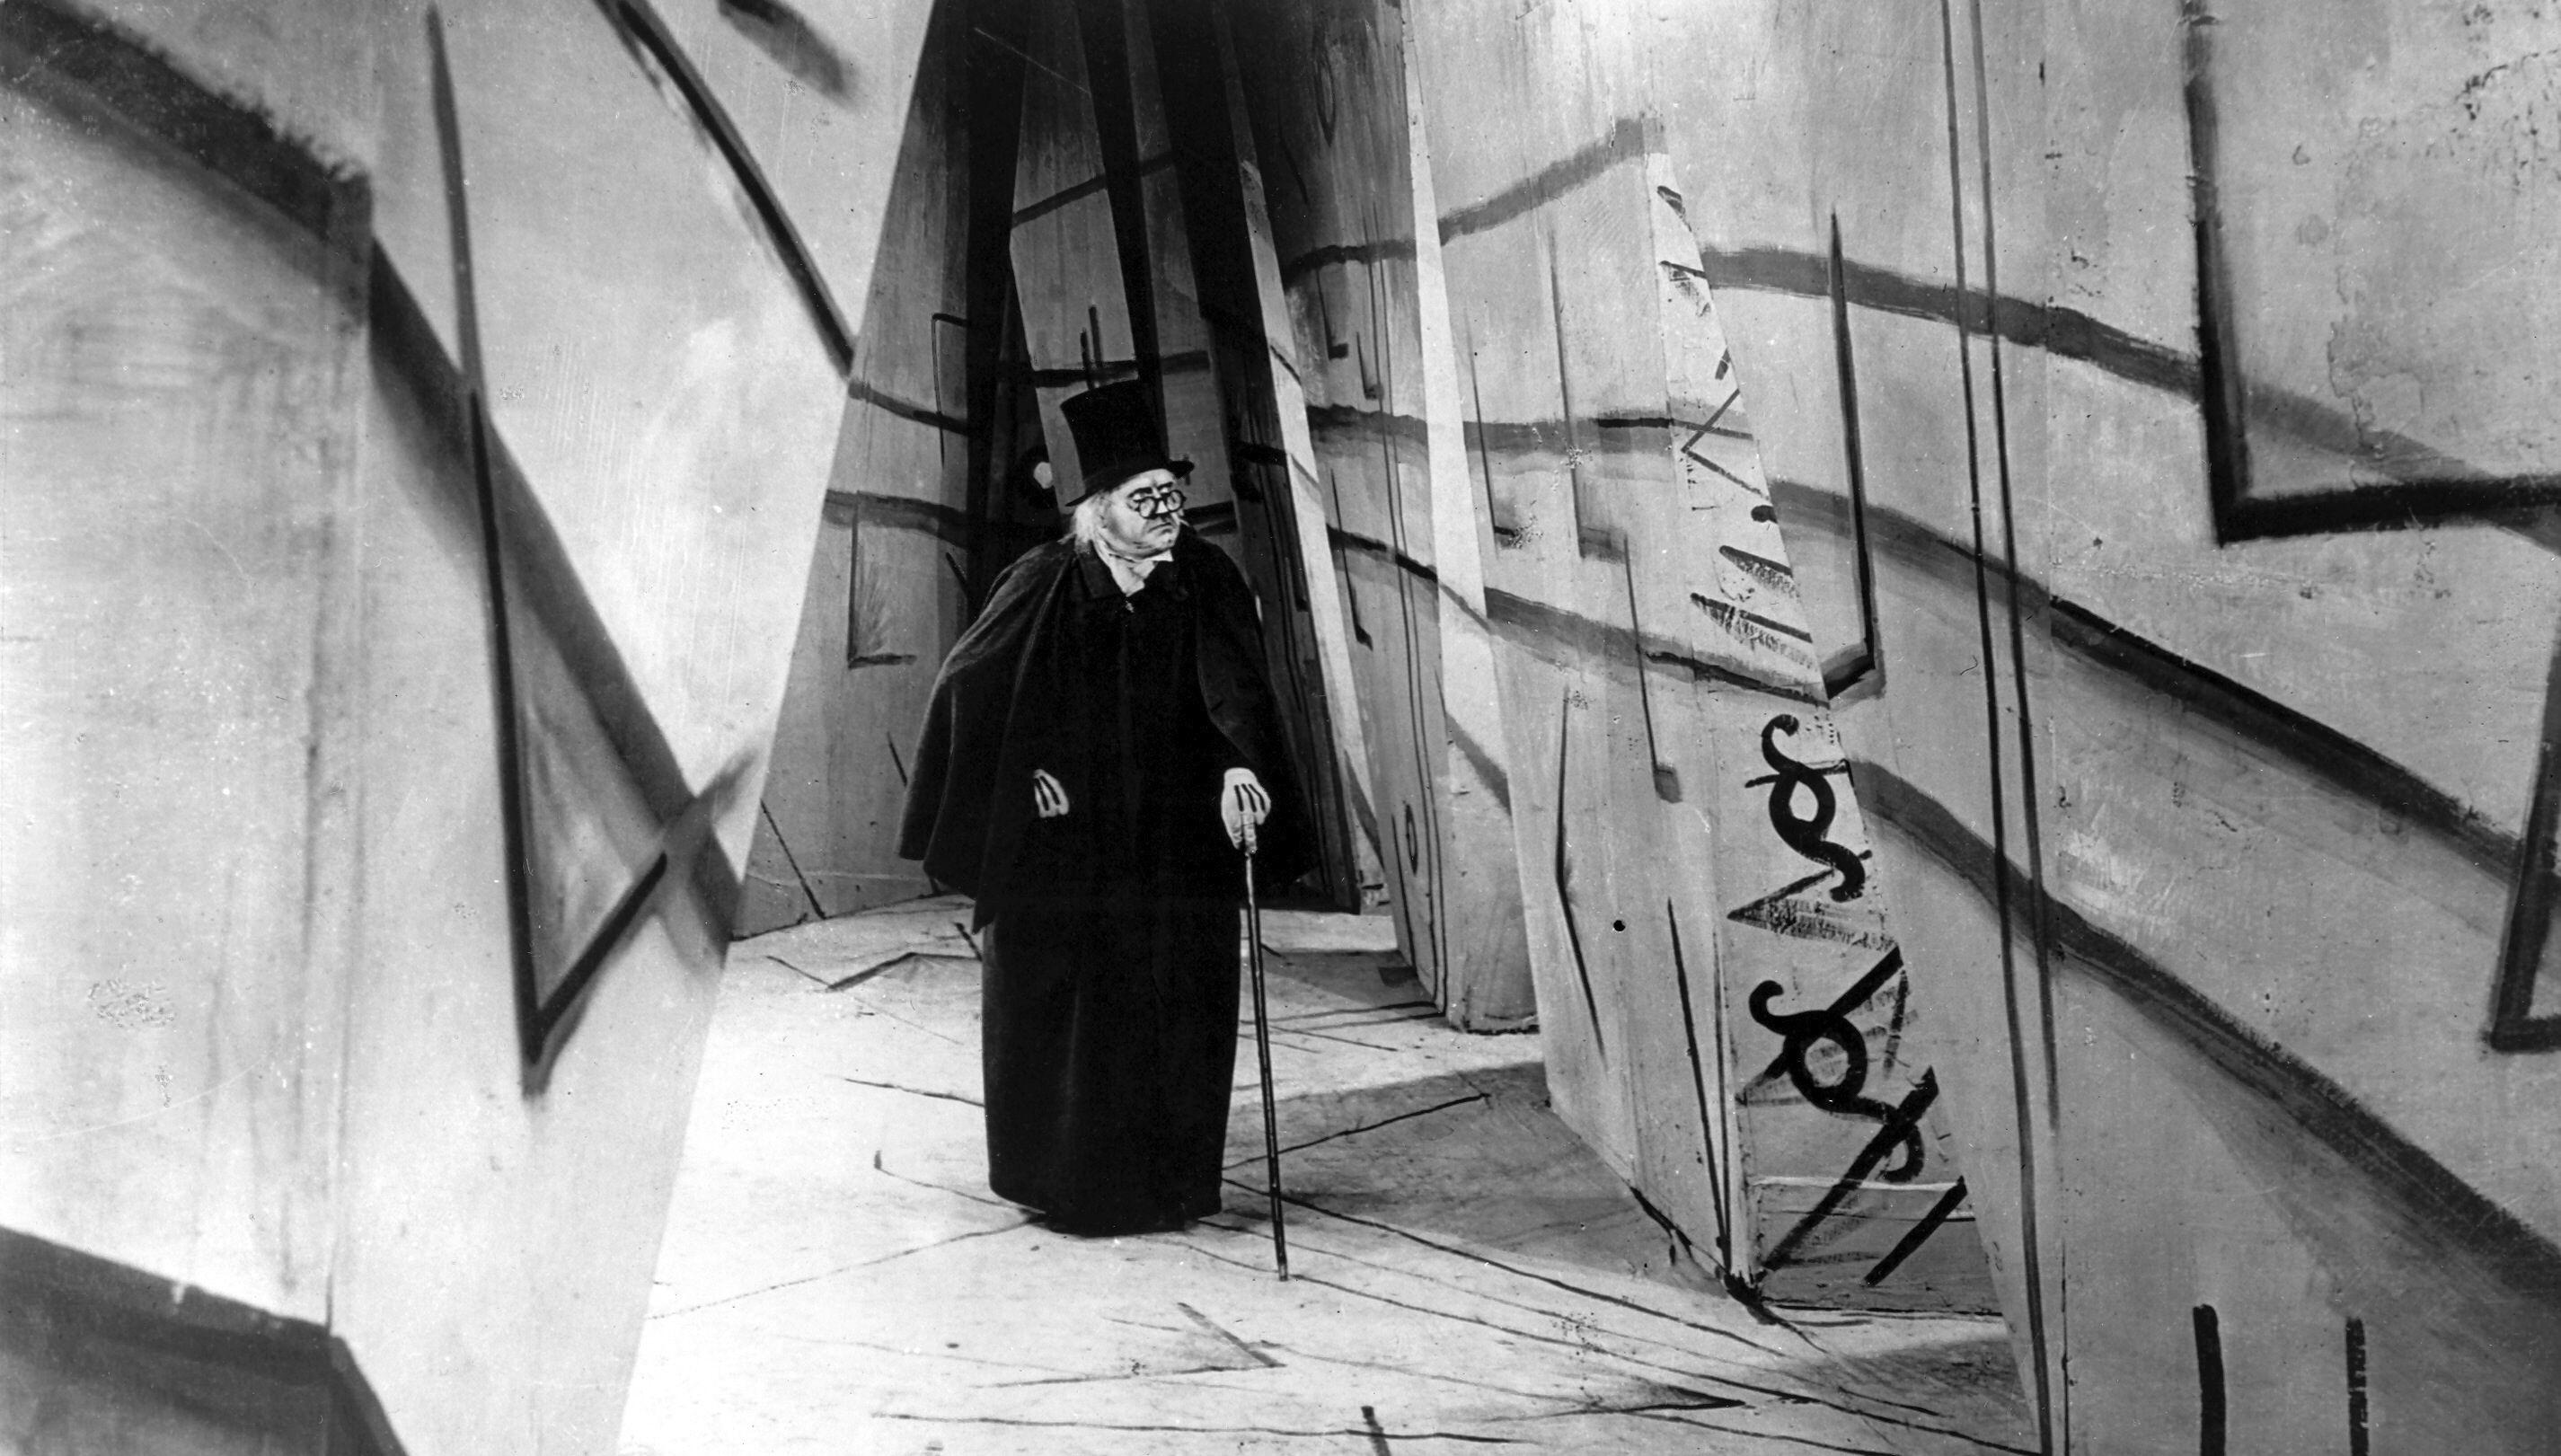 Das-Cabinet-des-Dr-Caligari-1920.jpg